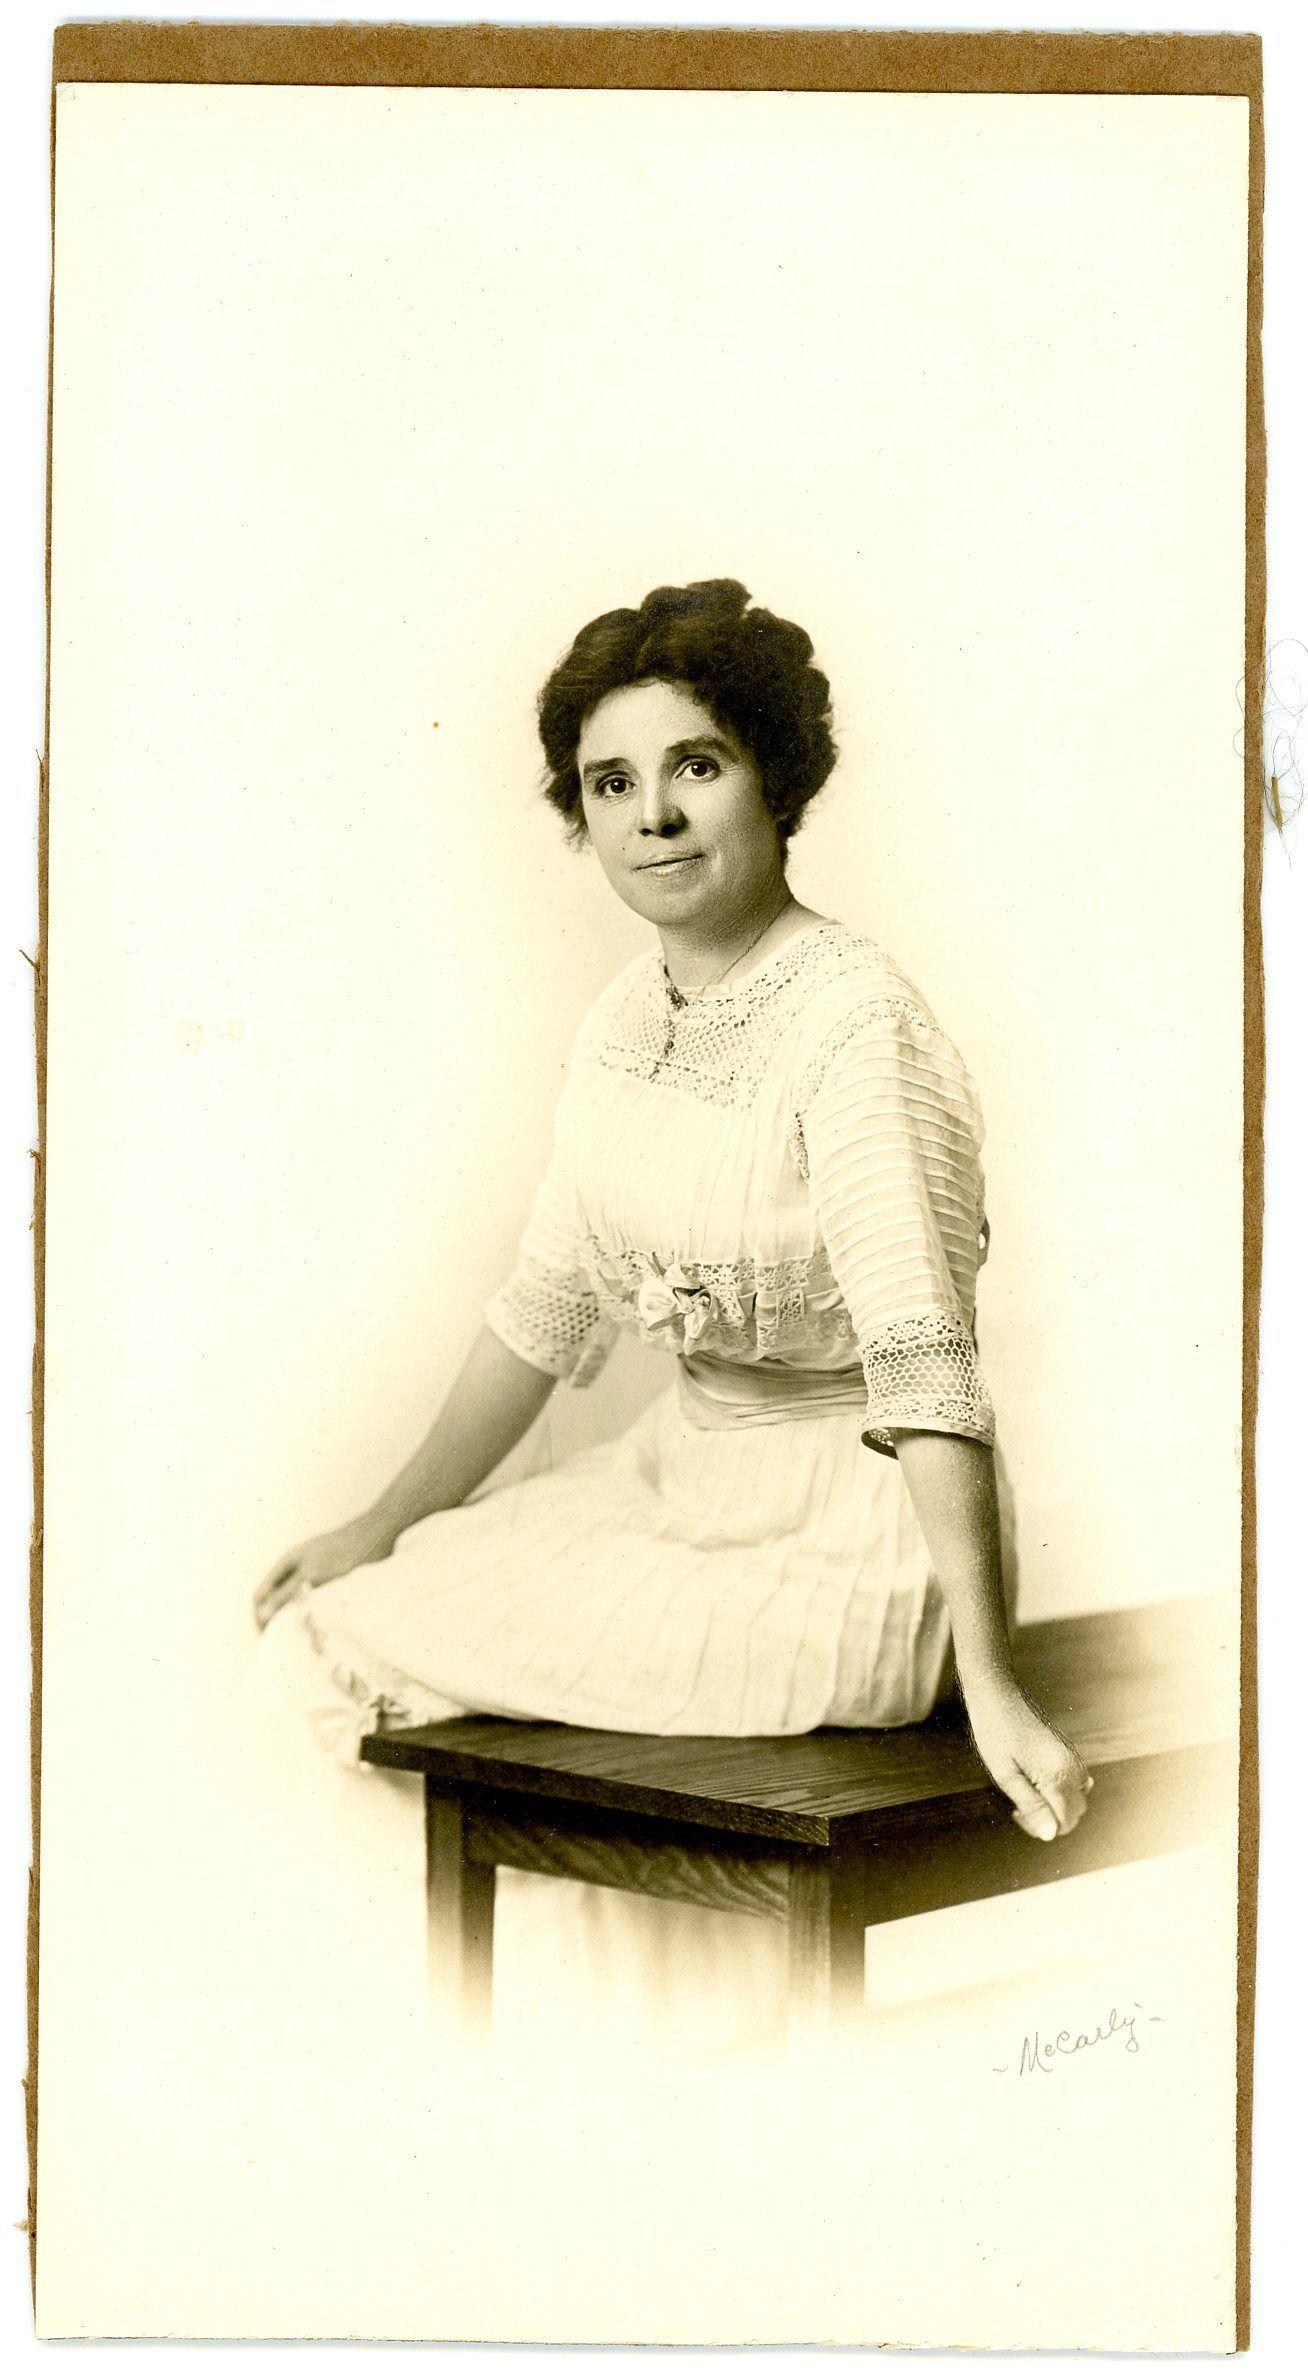 Mary Watson Kettler Dob 1859 Daughter Of Alexander M Watson Dob 1836 And Sarah Jane Hadley Watson Dob 1844